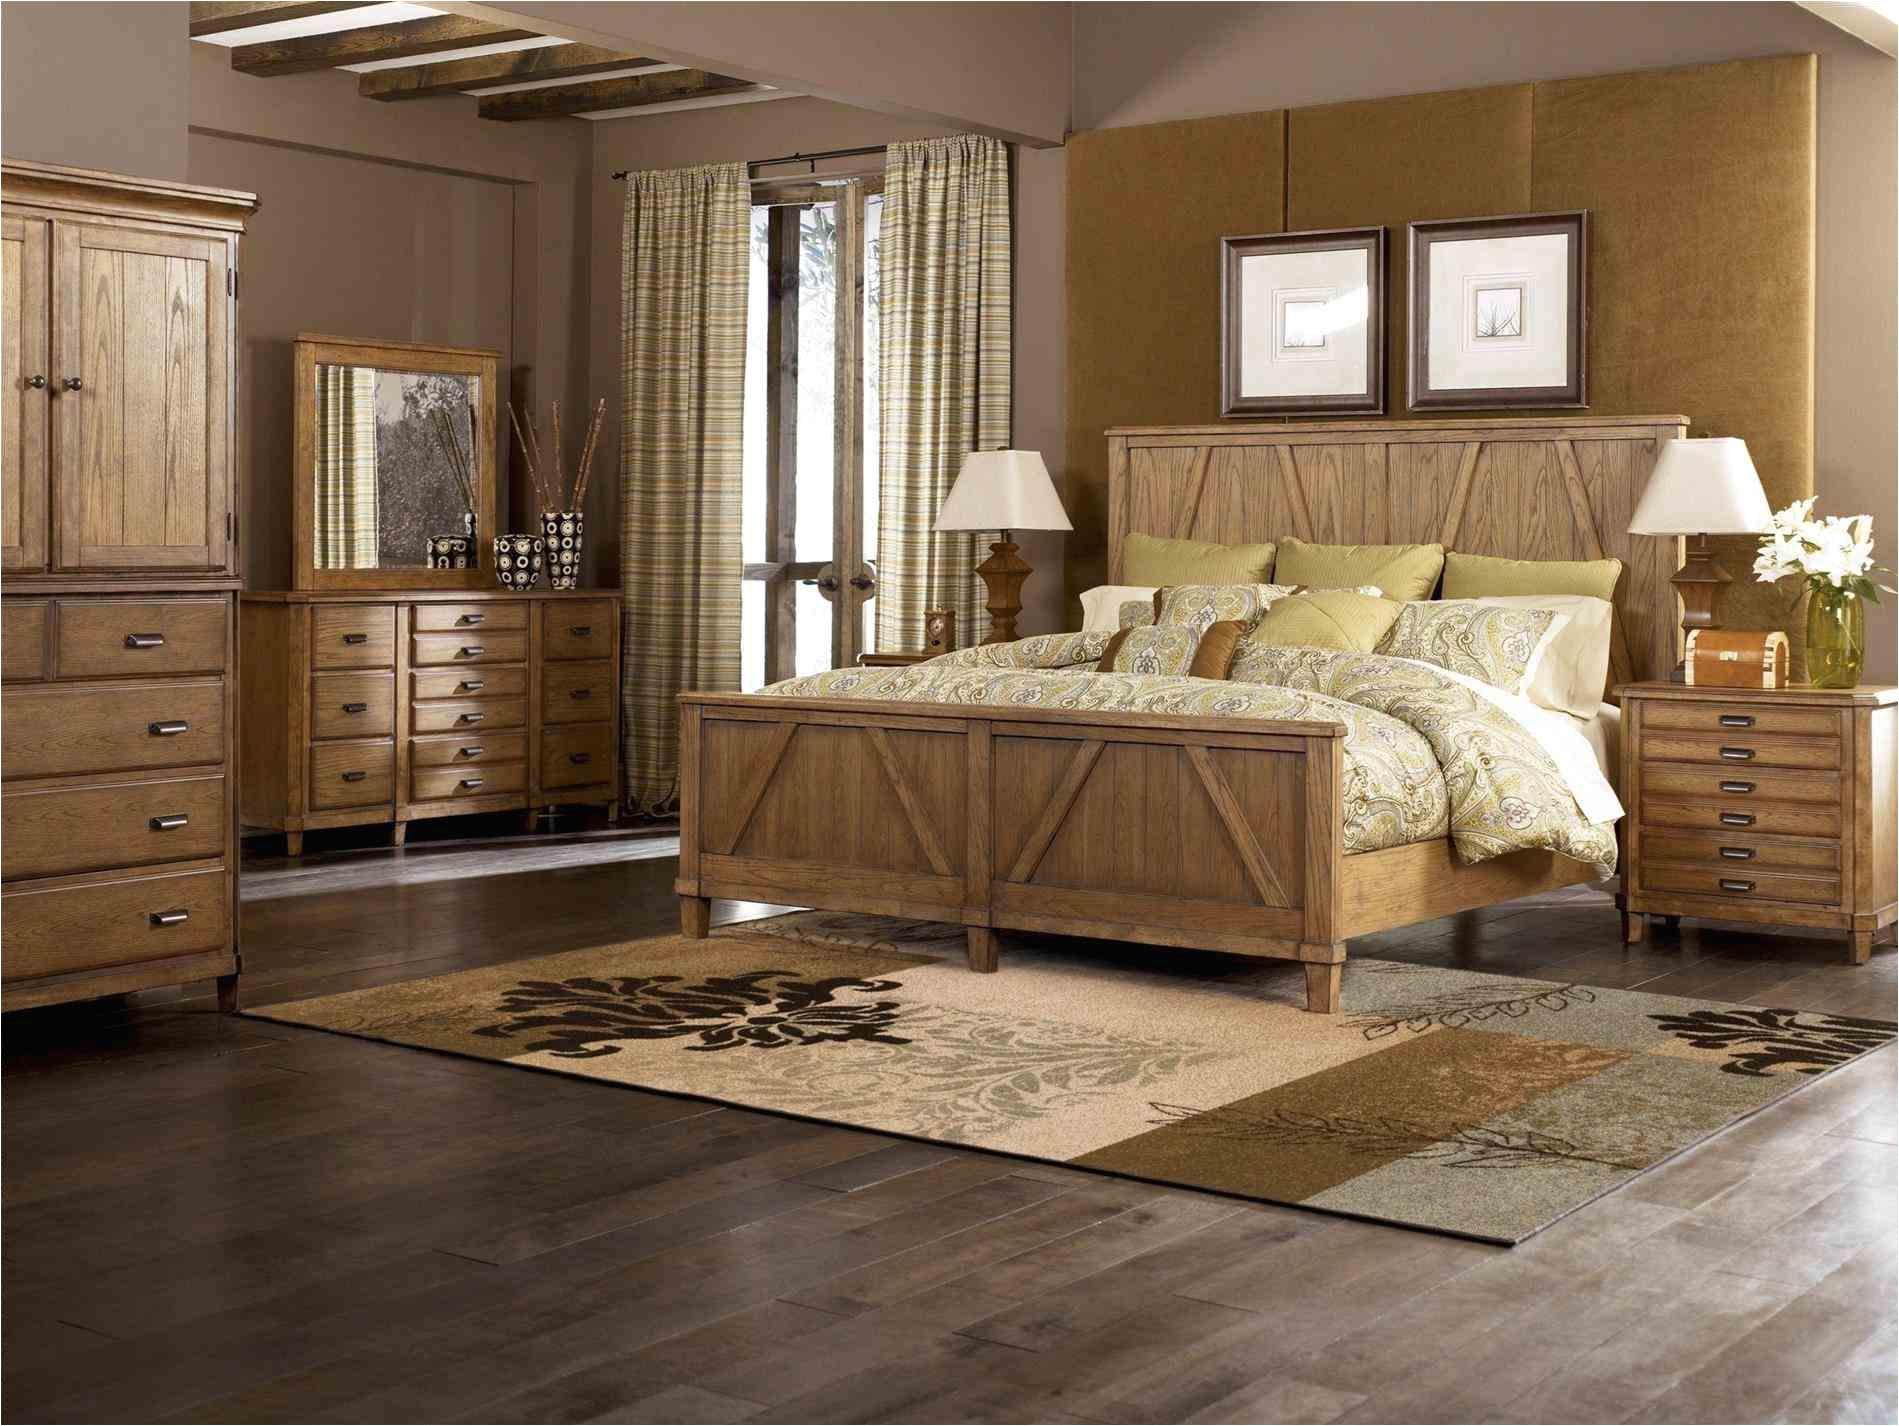 Rustic Furniture Denton Tx Inspect Home